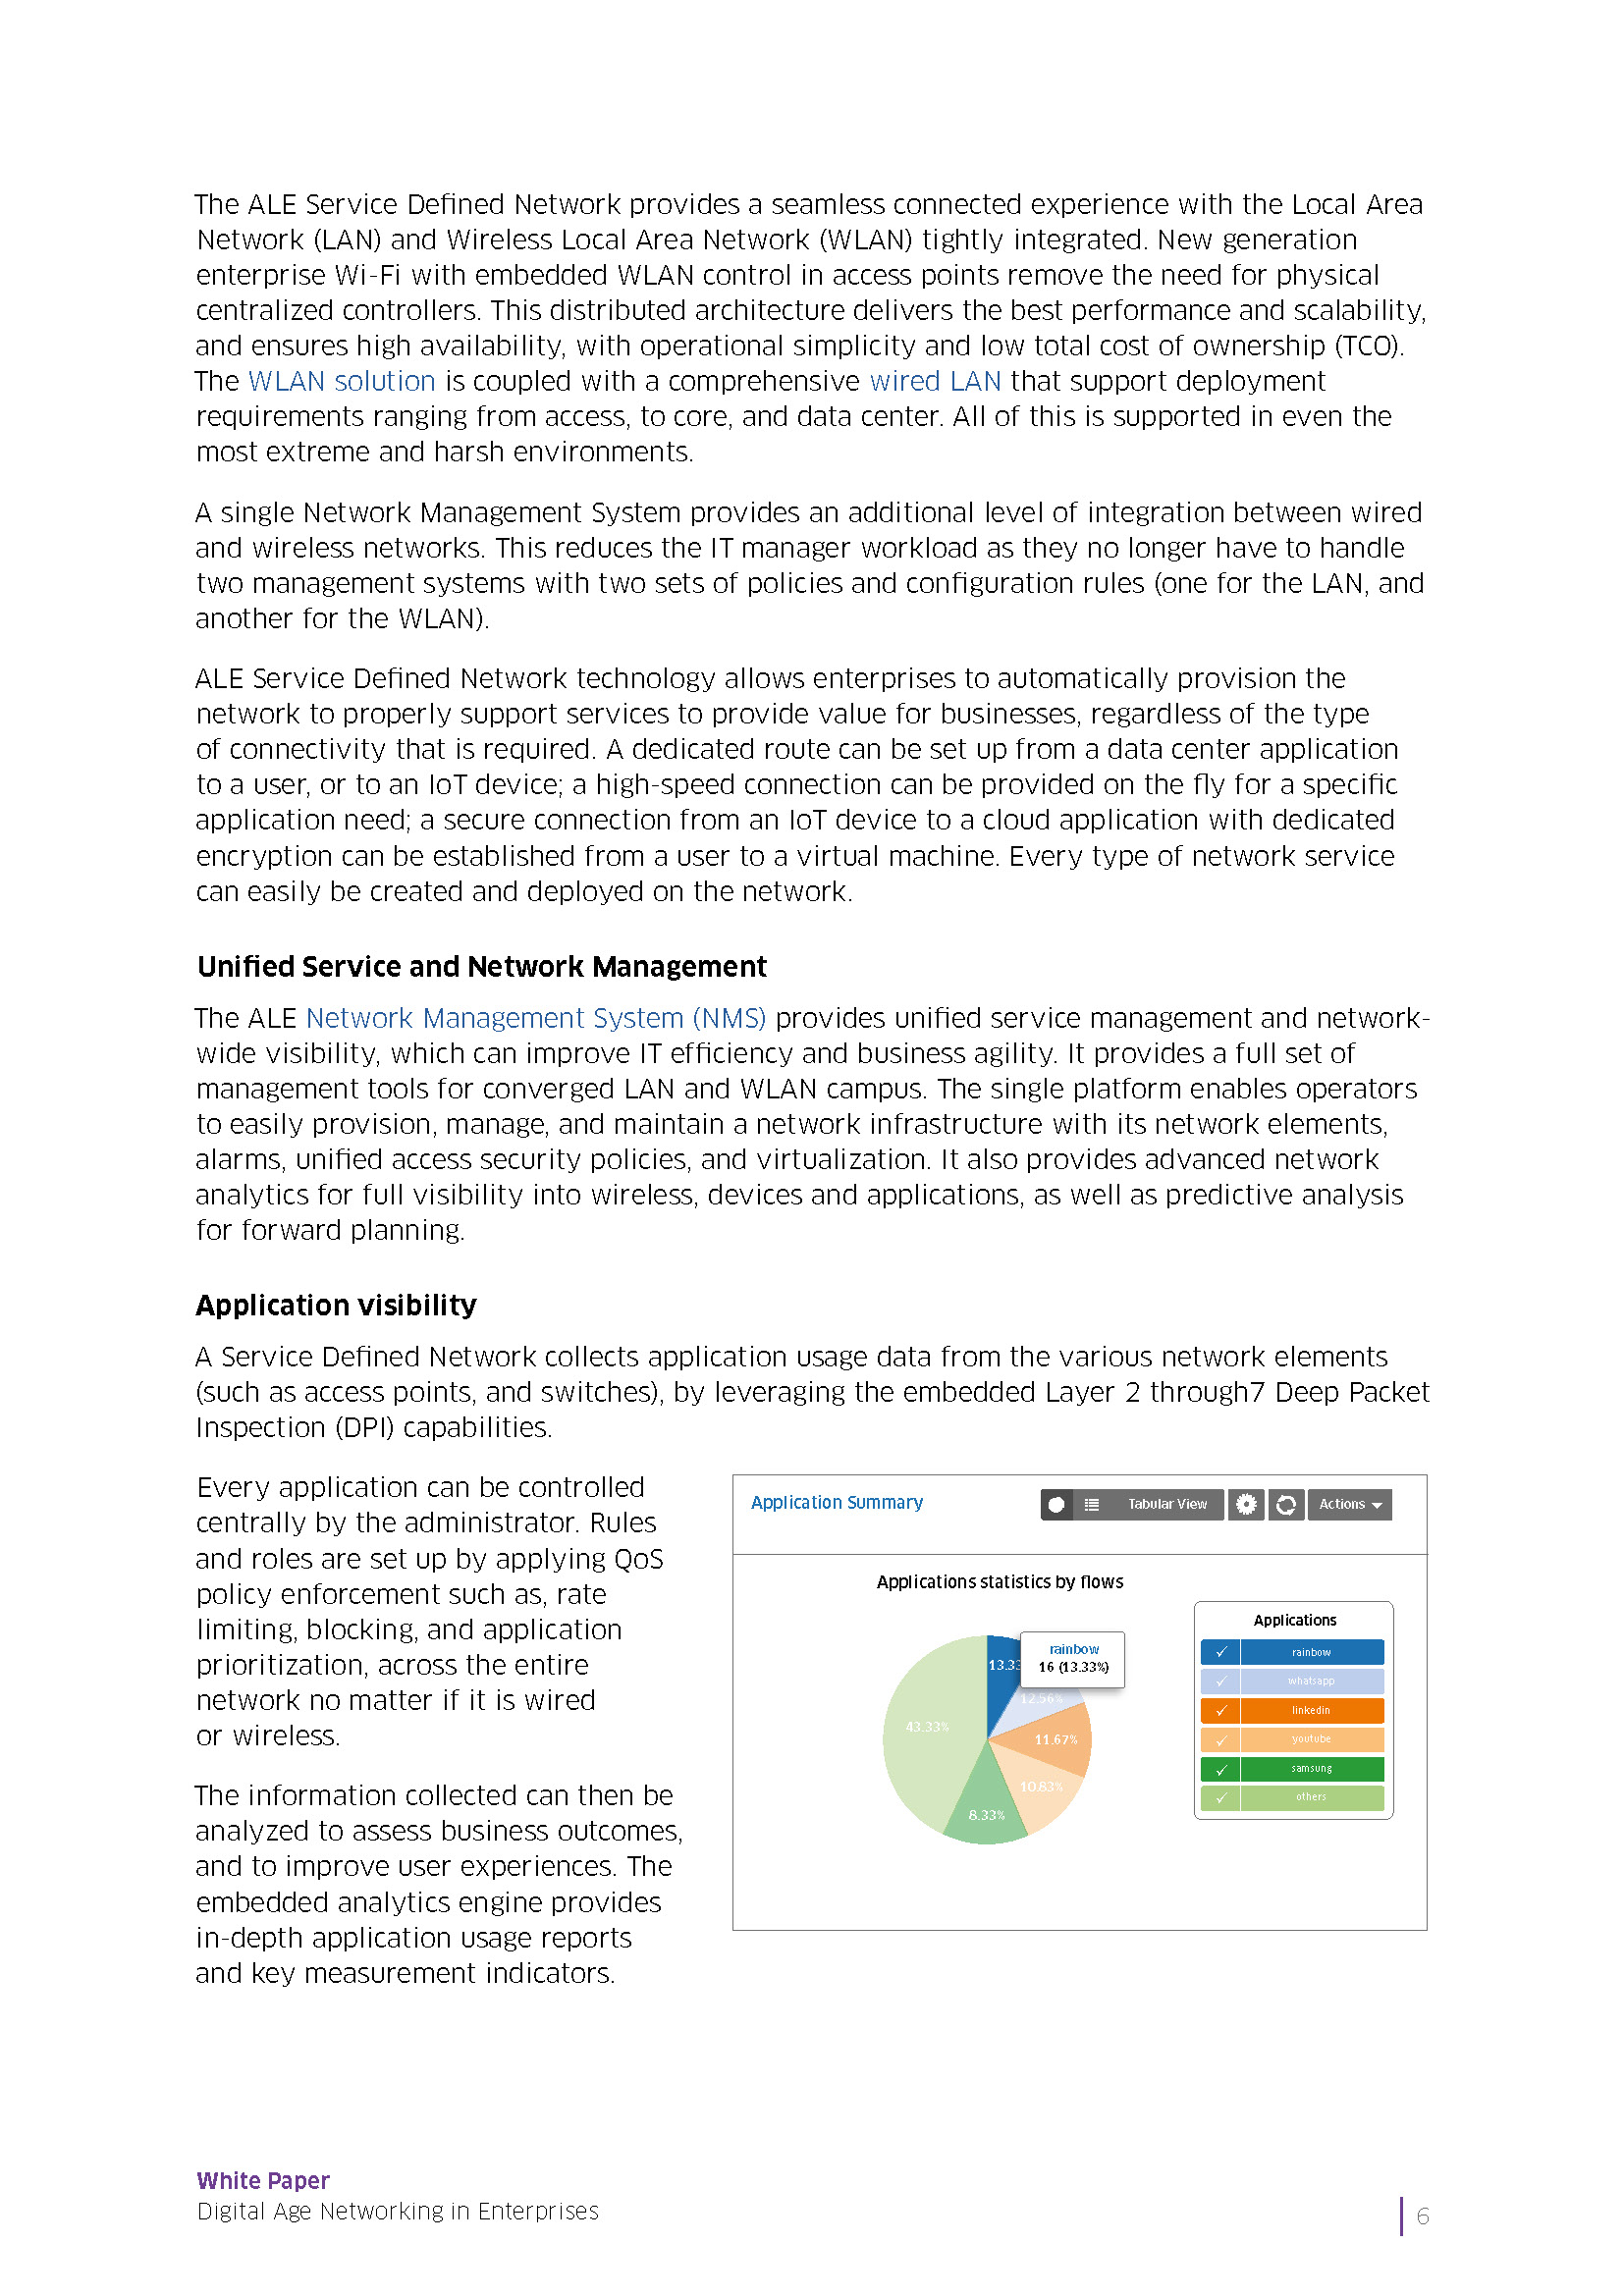 digital-age-networking-enterprises_Page_06